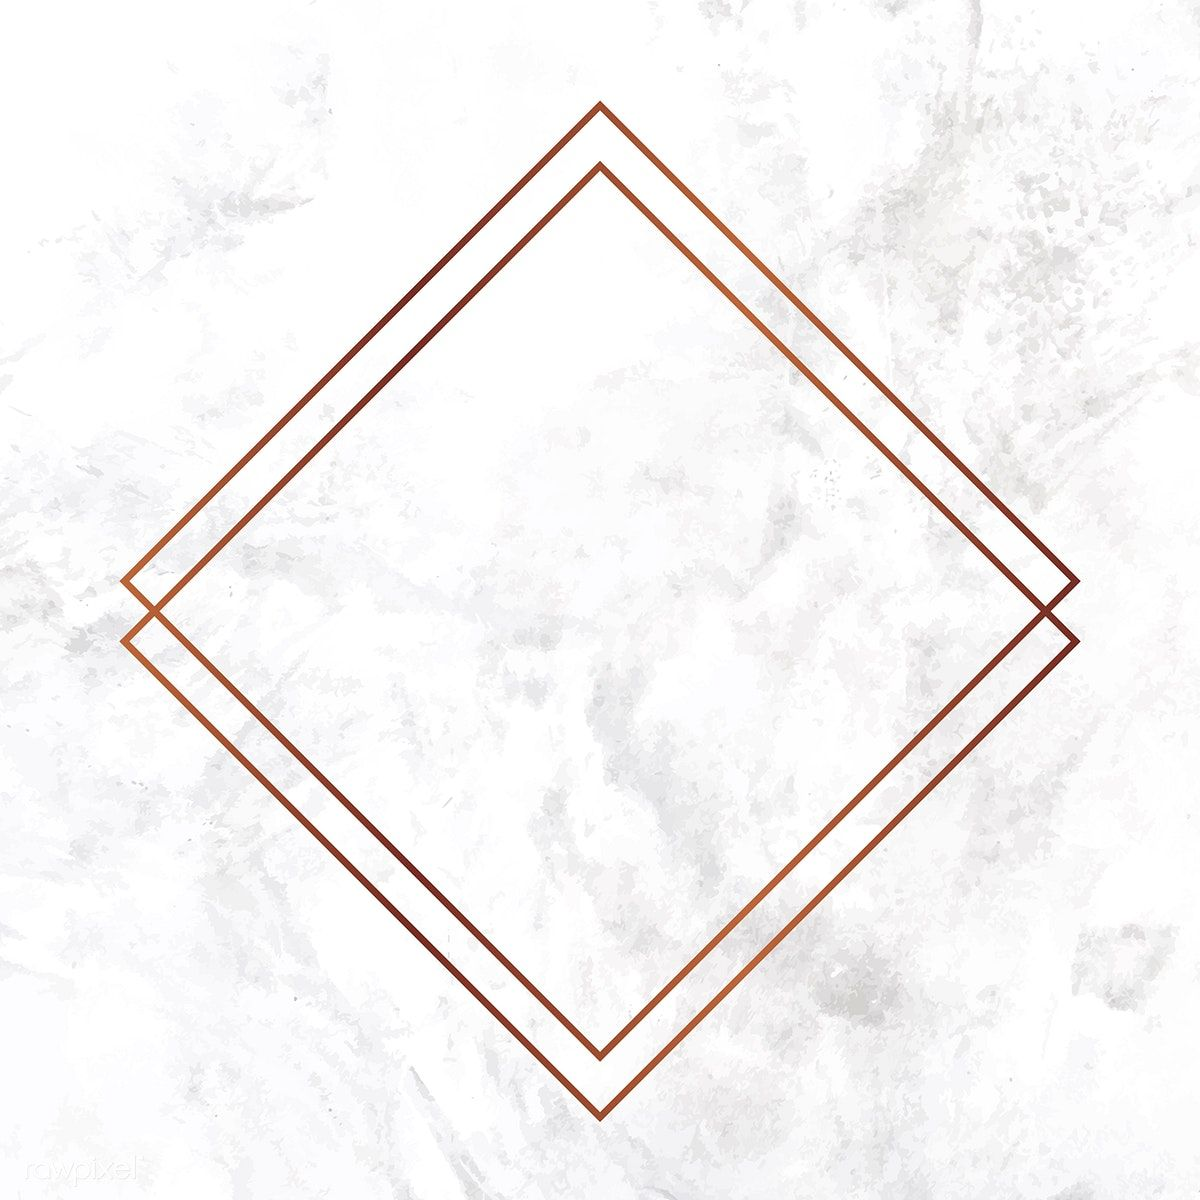 Download Premium Vector Of Rhombus Copper Frame On Marble Background Marble Background Copper Frame Floral Border Design